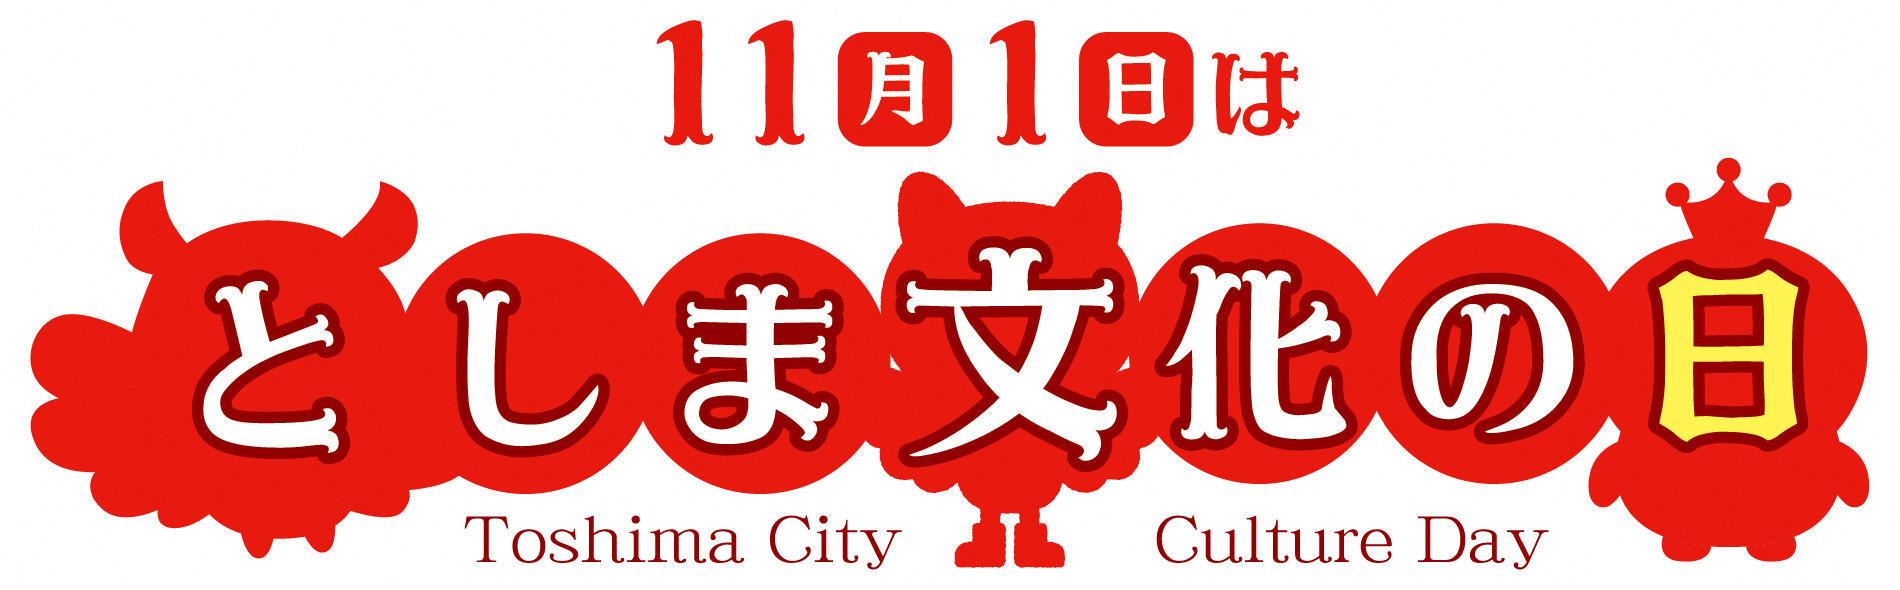 CultureDay_Logo-E_typeA.jpg